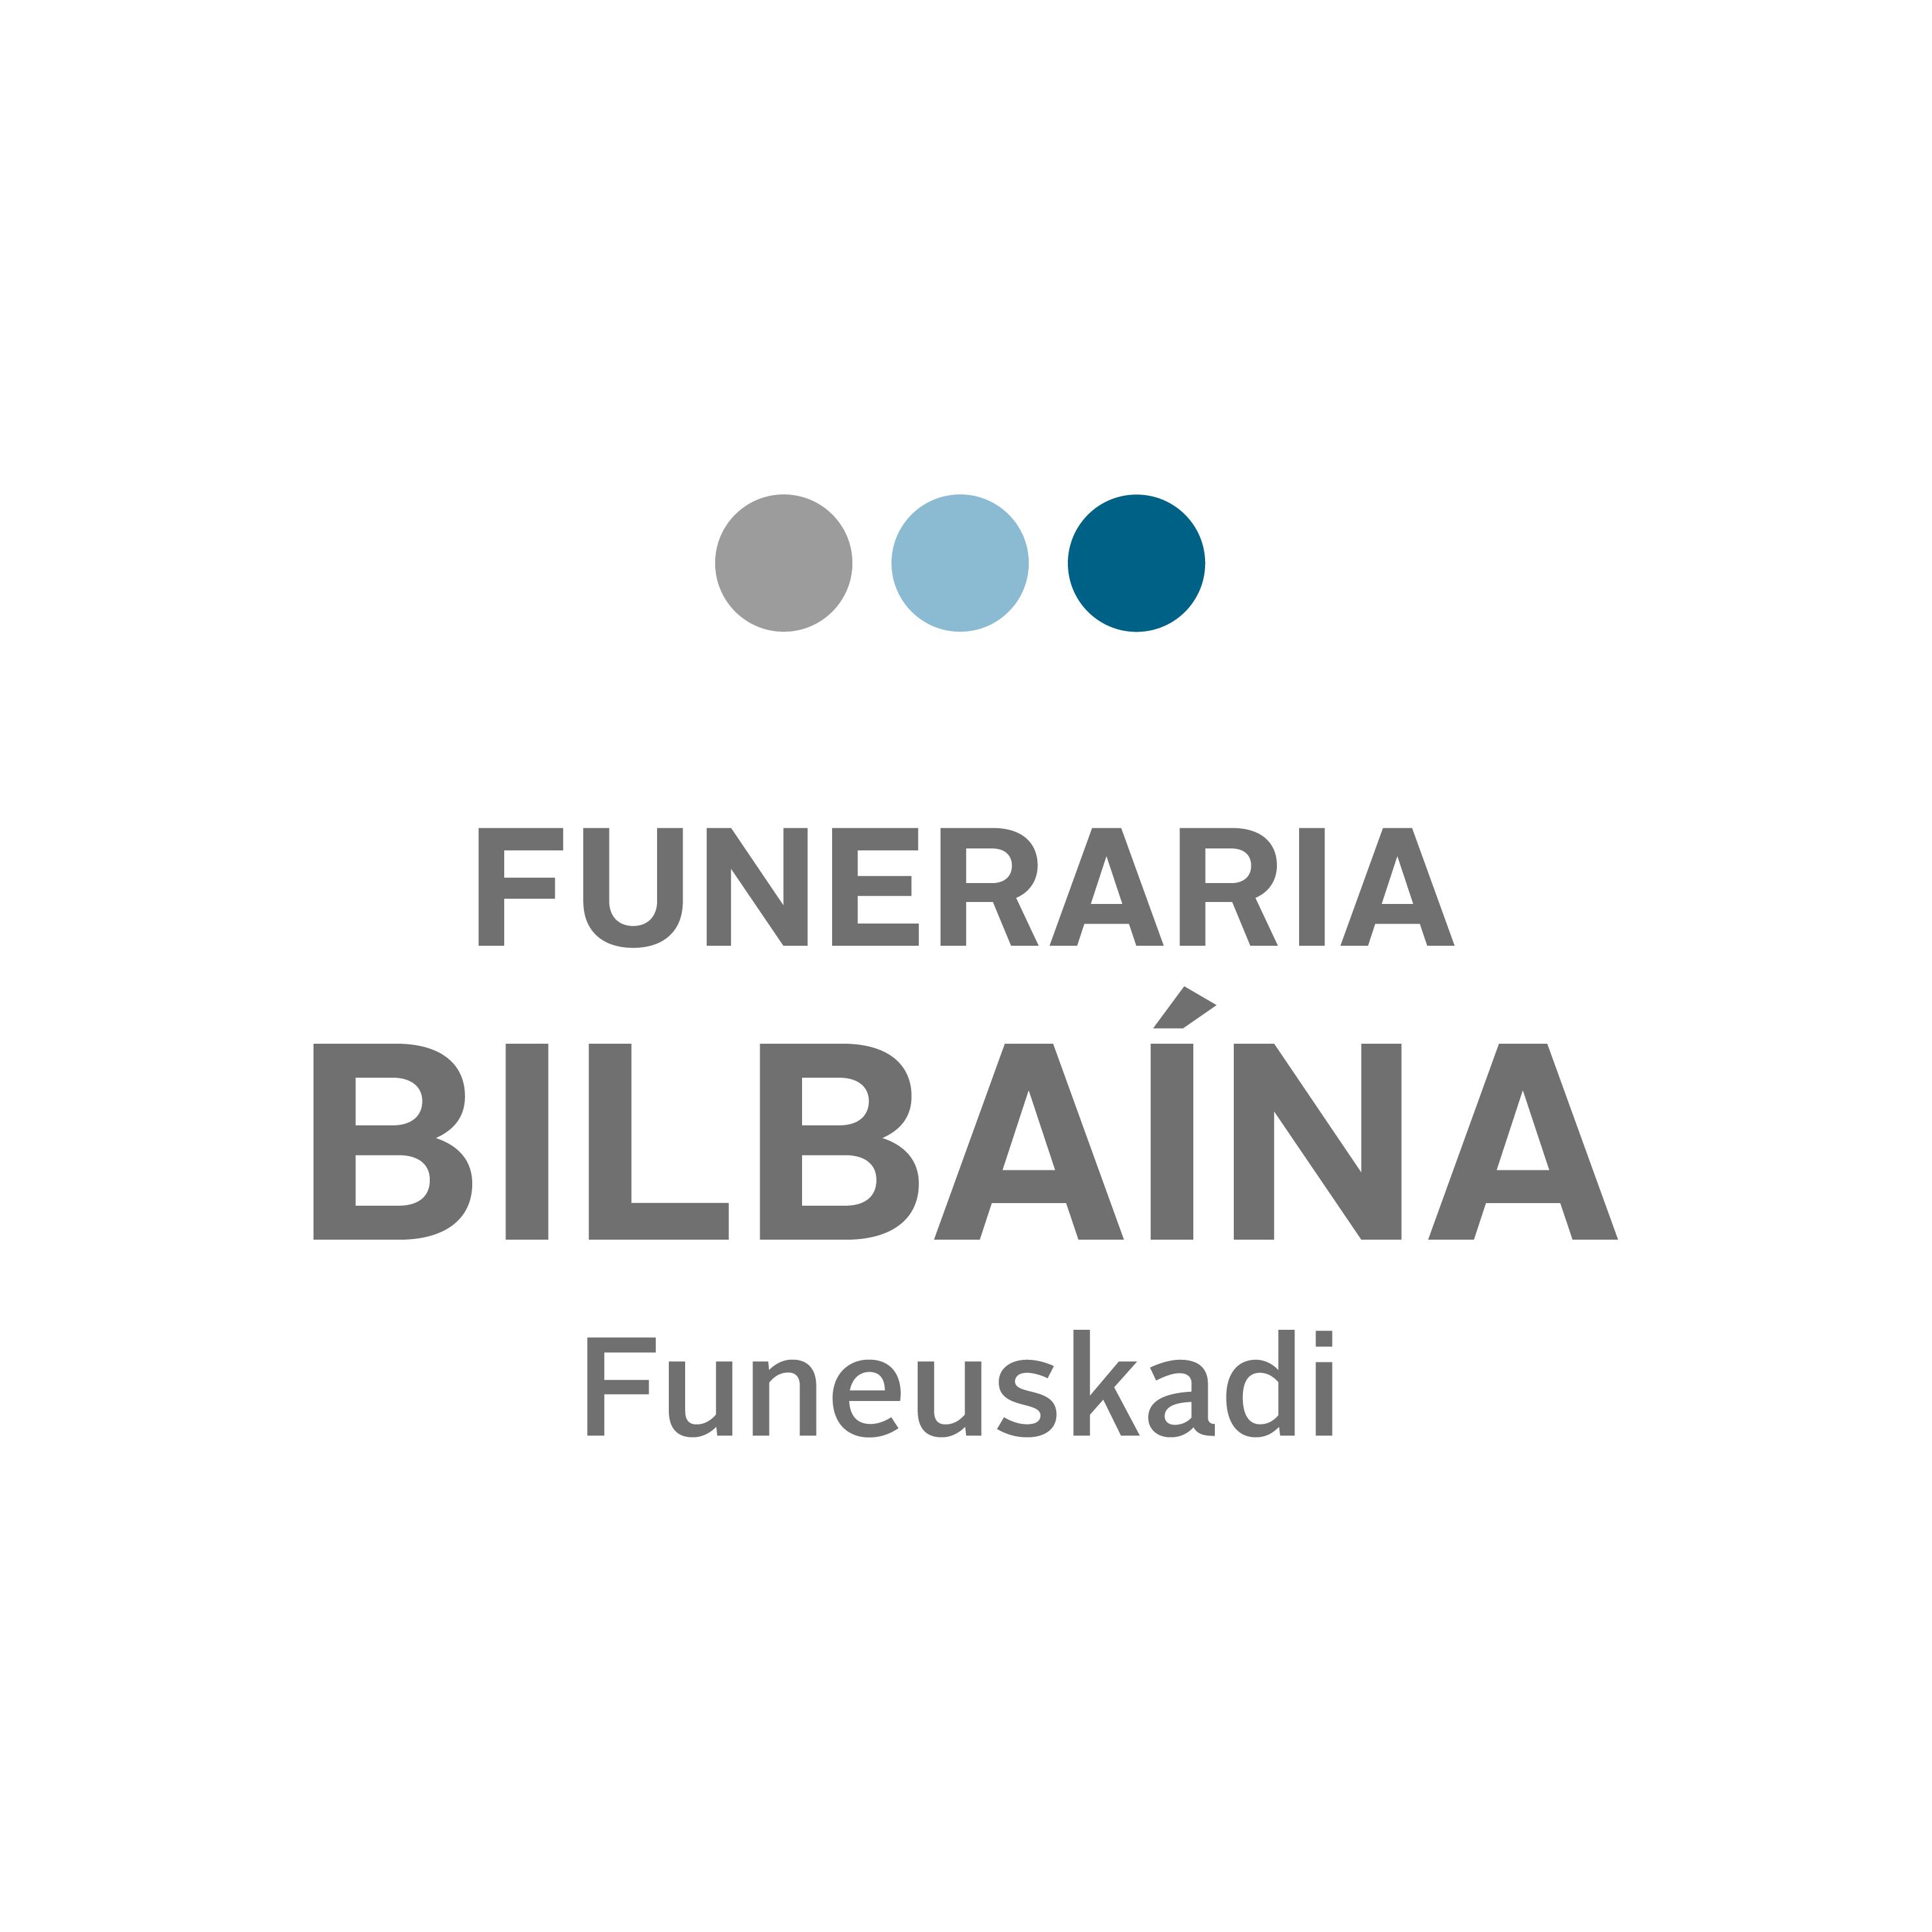 FUNERARIA BILBAINA